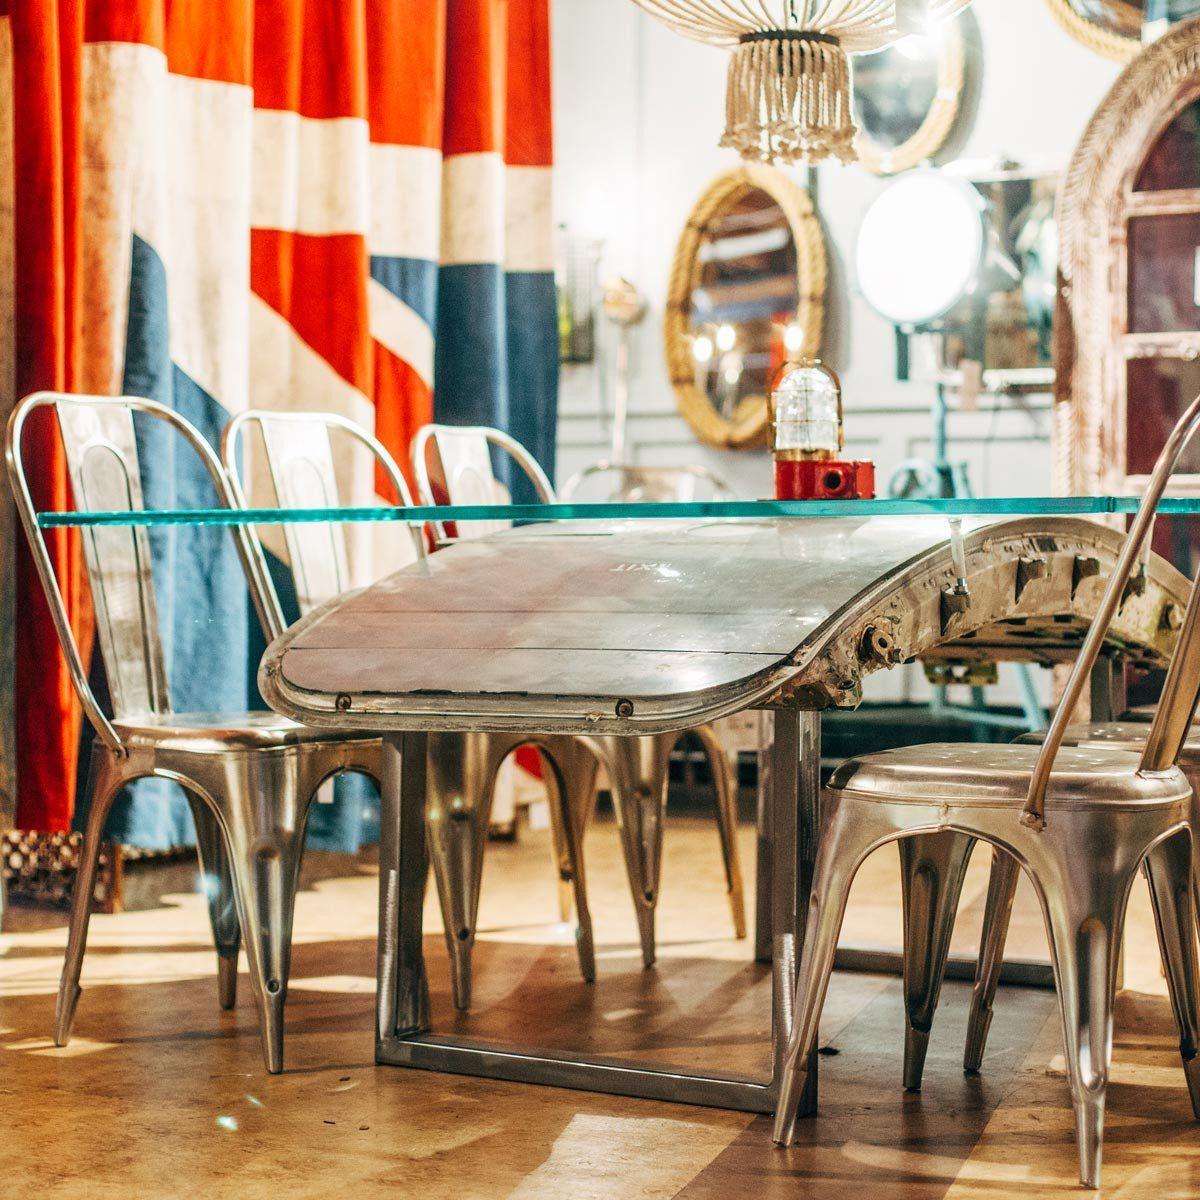 Room 24e Airplane Dining Table Hatch DoorCustom